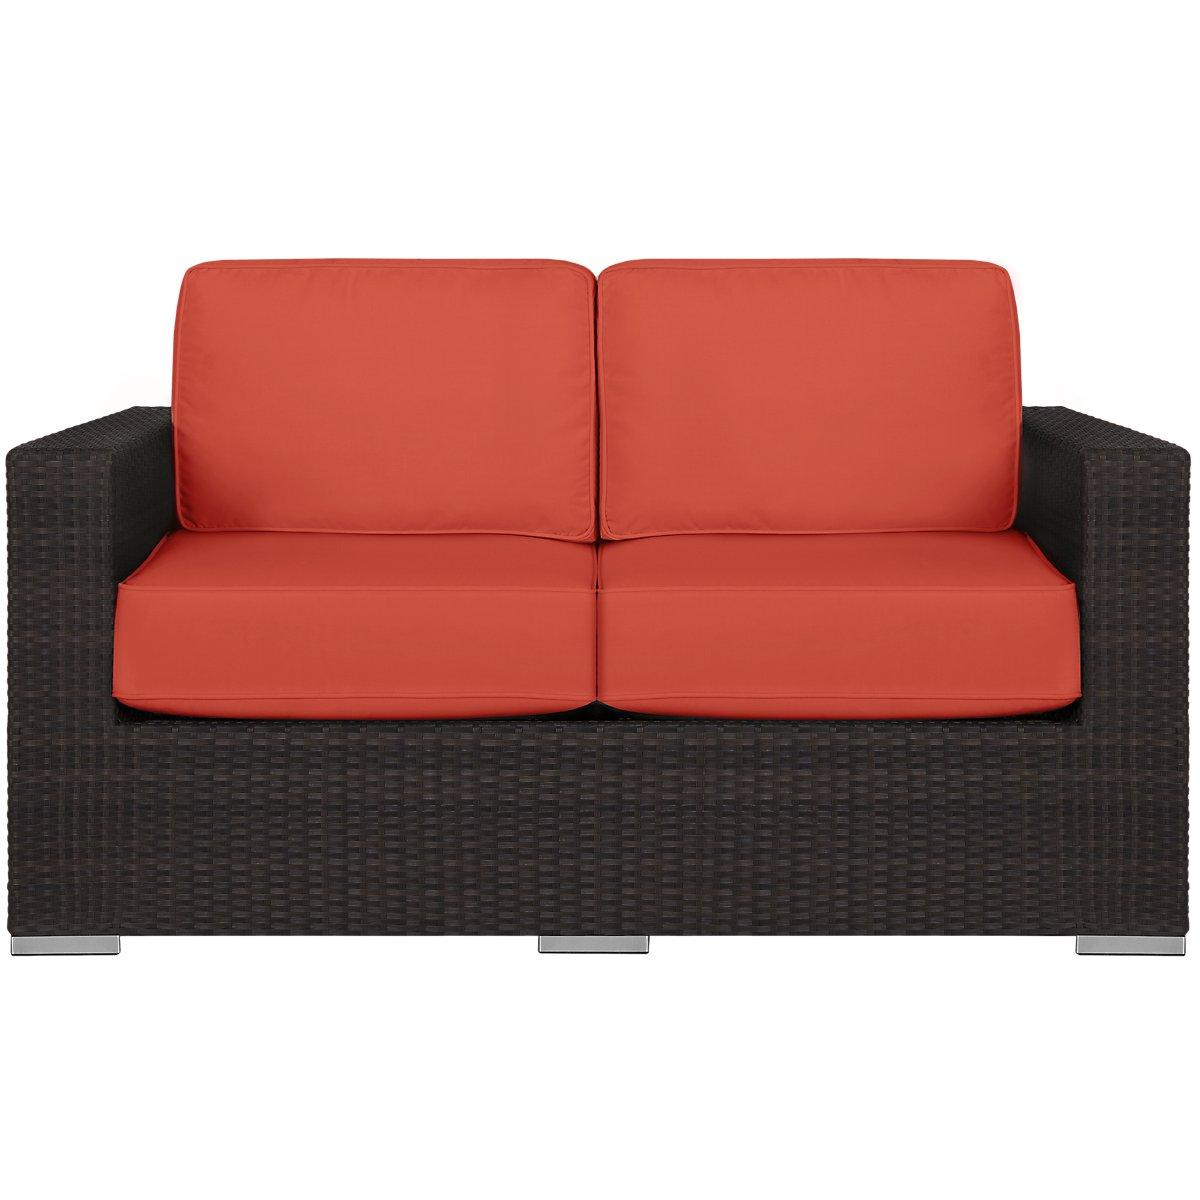 City Furniture Fina Orange Loveseat